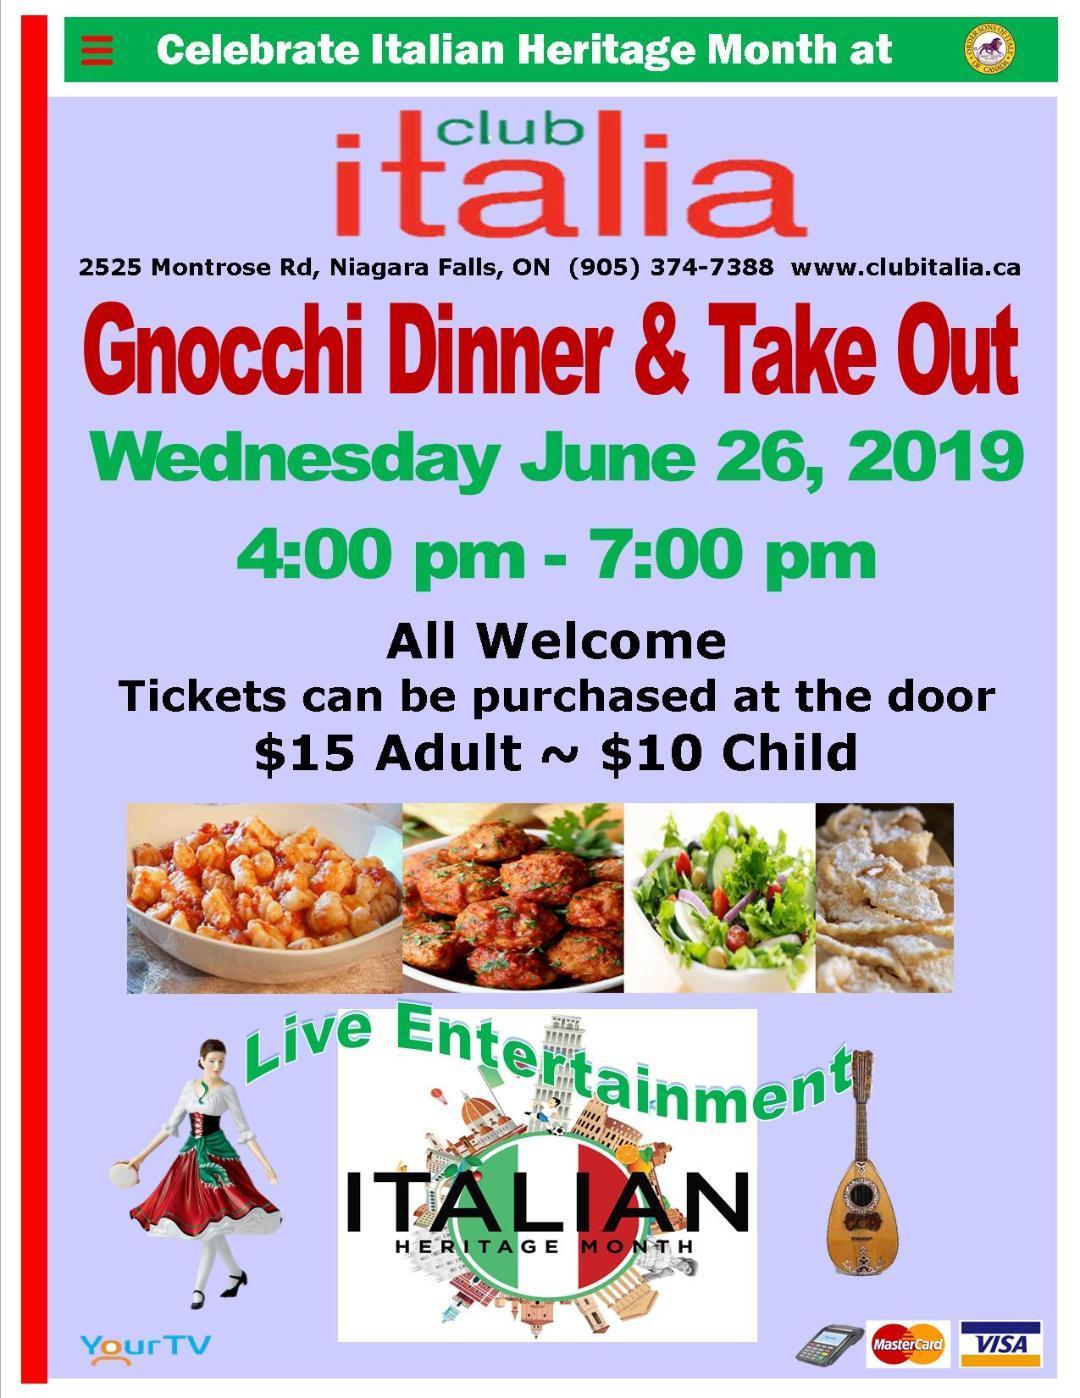 heritage-month-gnocchi-dinner.jpg